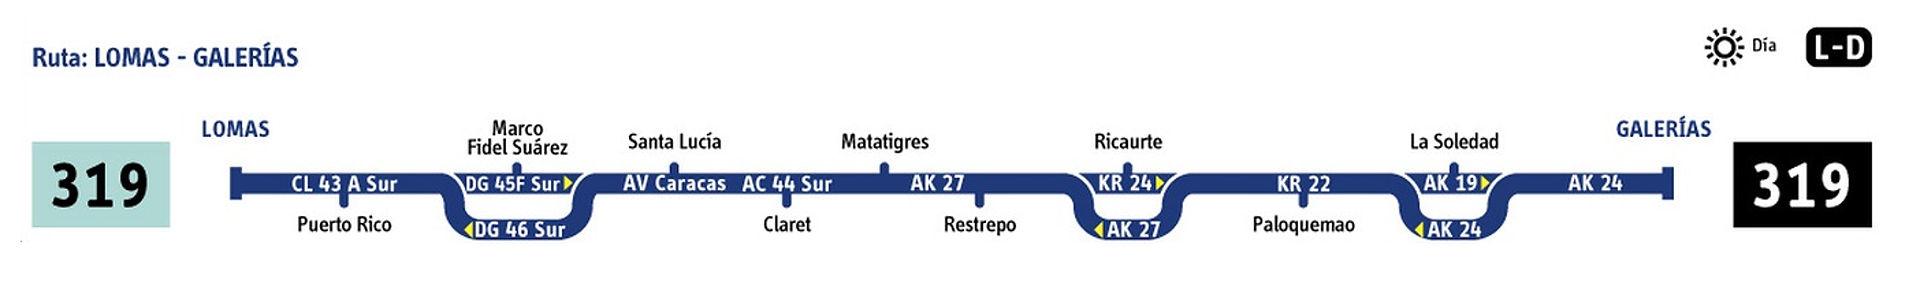 Ruta SITP: 319 Lomas ↔ Villa Cindy (Recortada hasta 7 de Agosto) [Urbana] 6